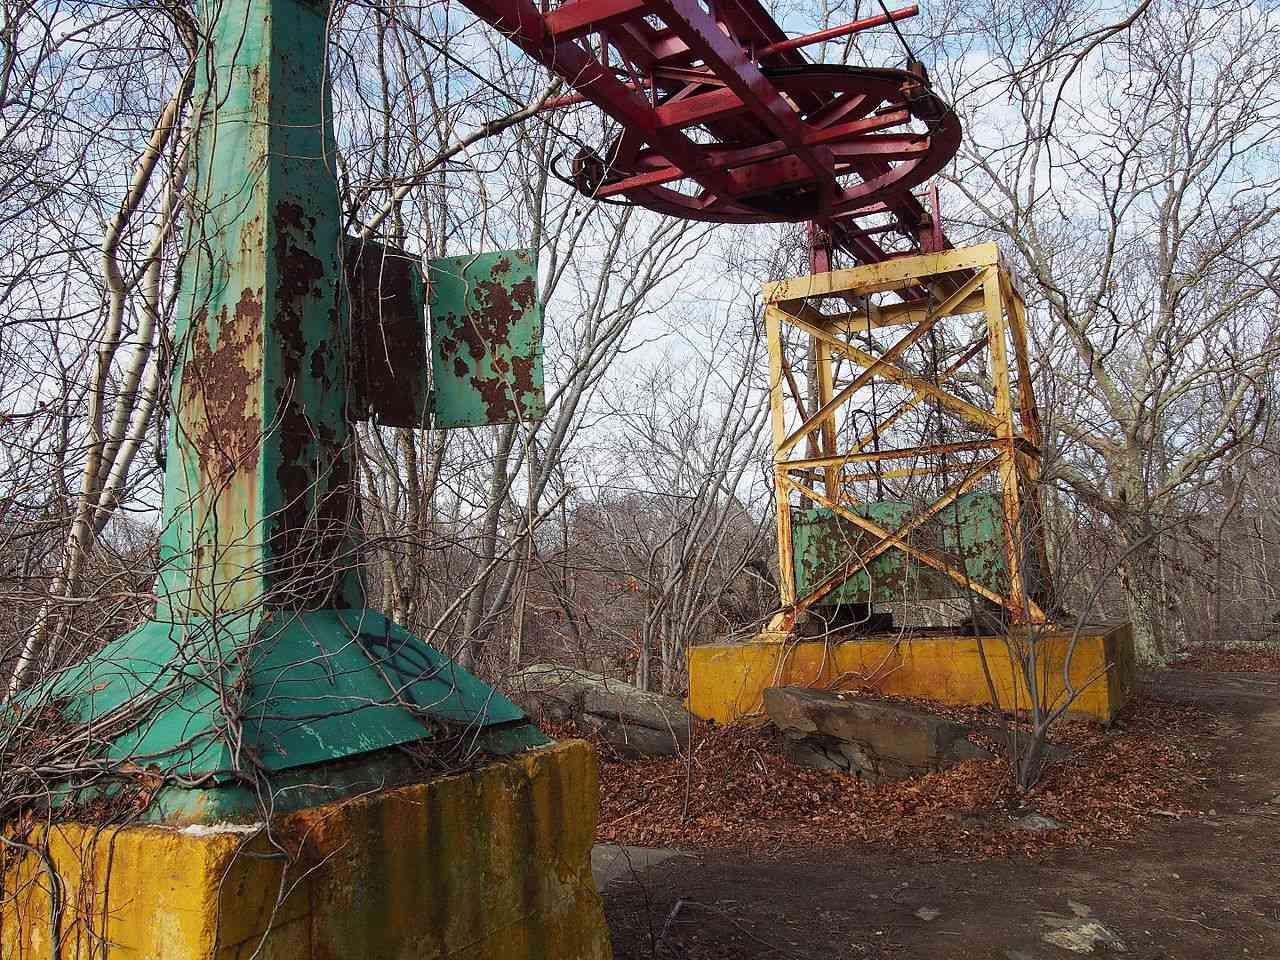 Rocky Point abandoned amusement park